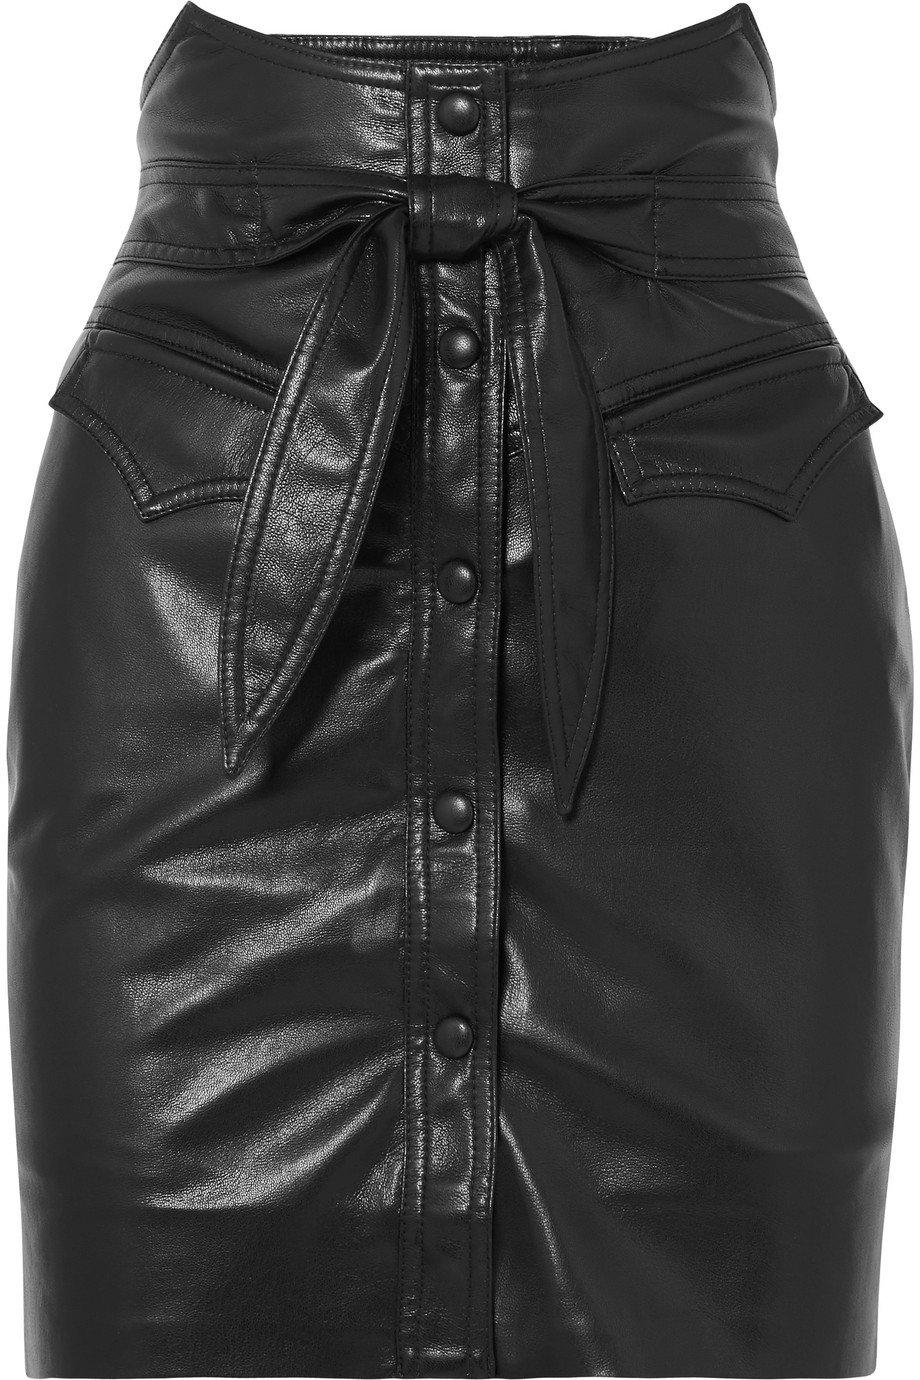 Nanushka | Reese belted vegan leather mini skirt | NET-A-PORTER.COM